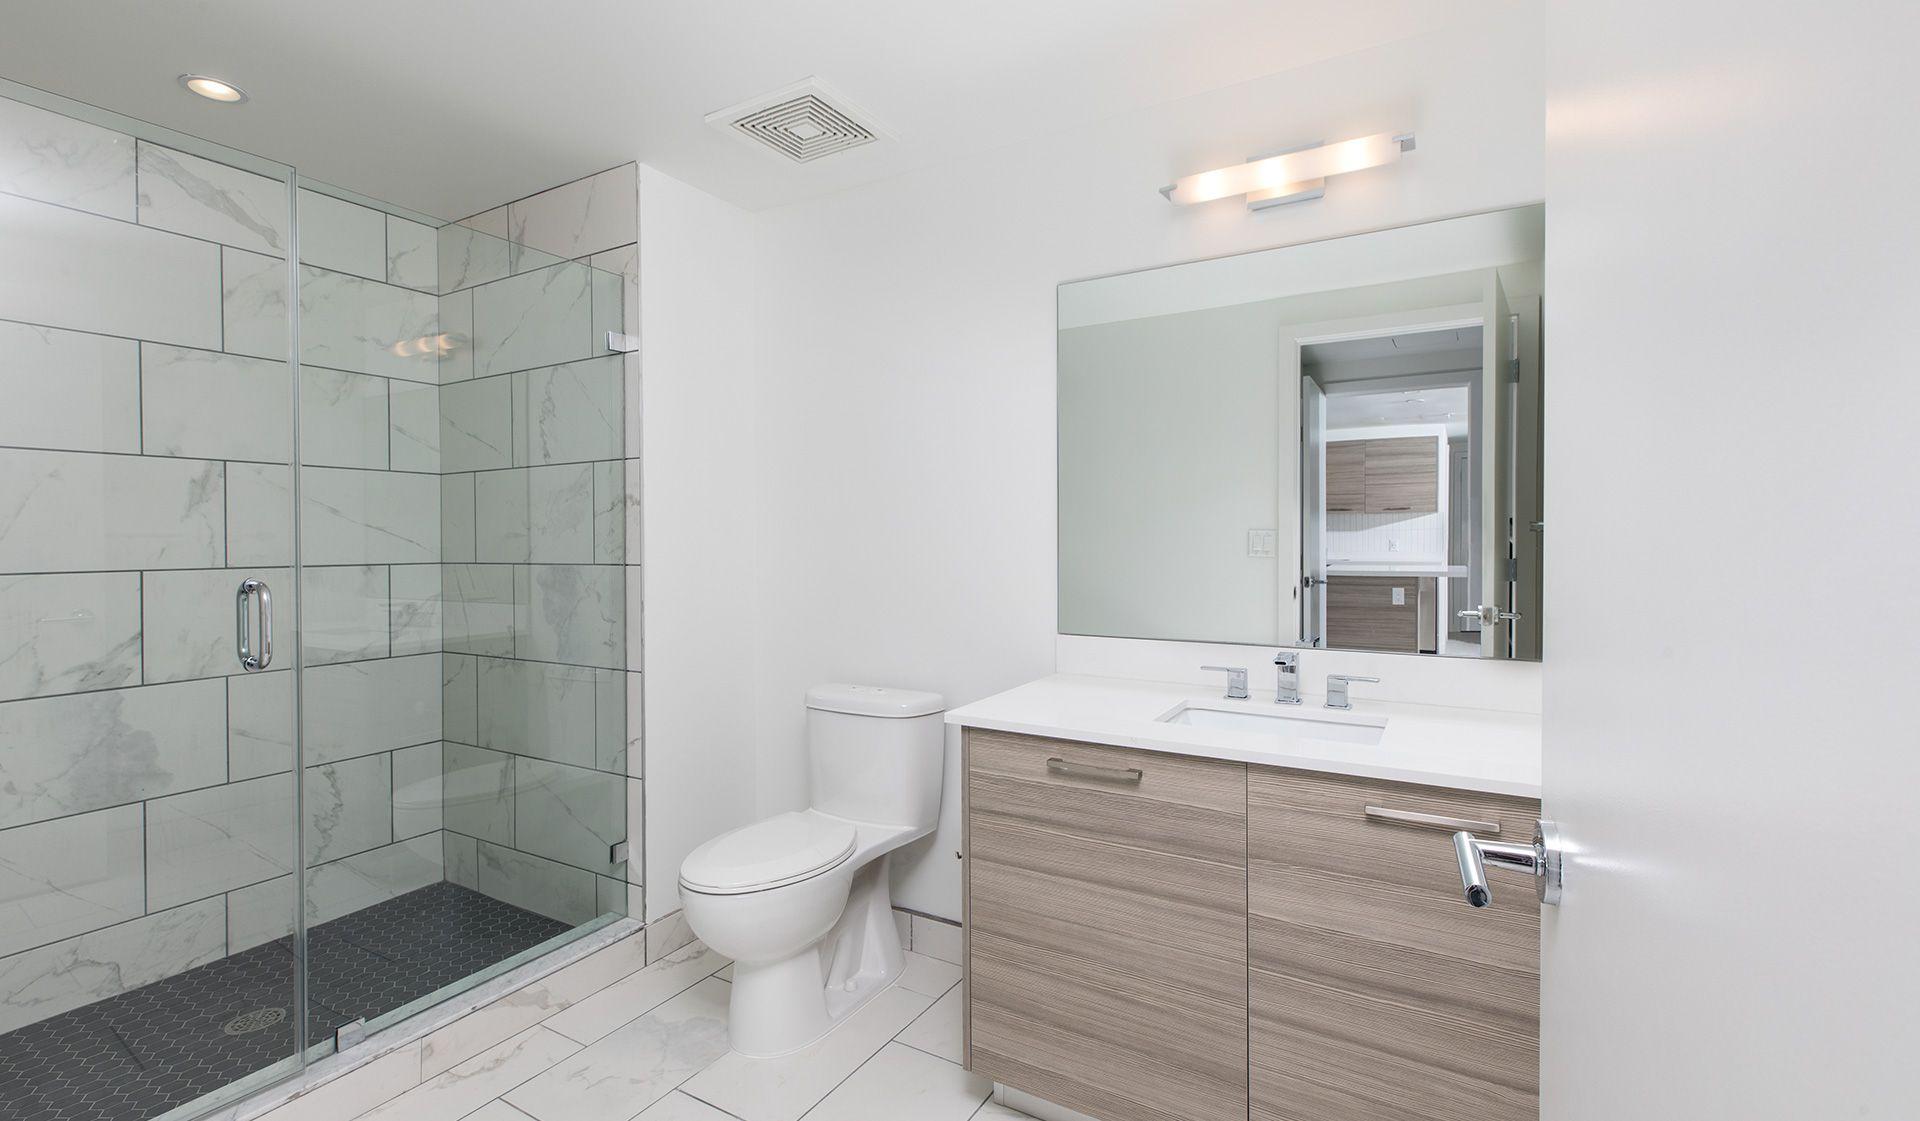 Premium bathrooms feature quartz countertops, porcelain tile floor ...